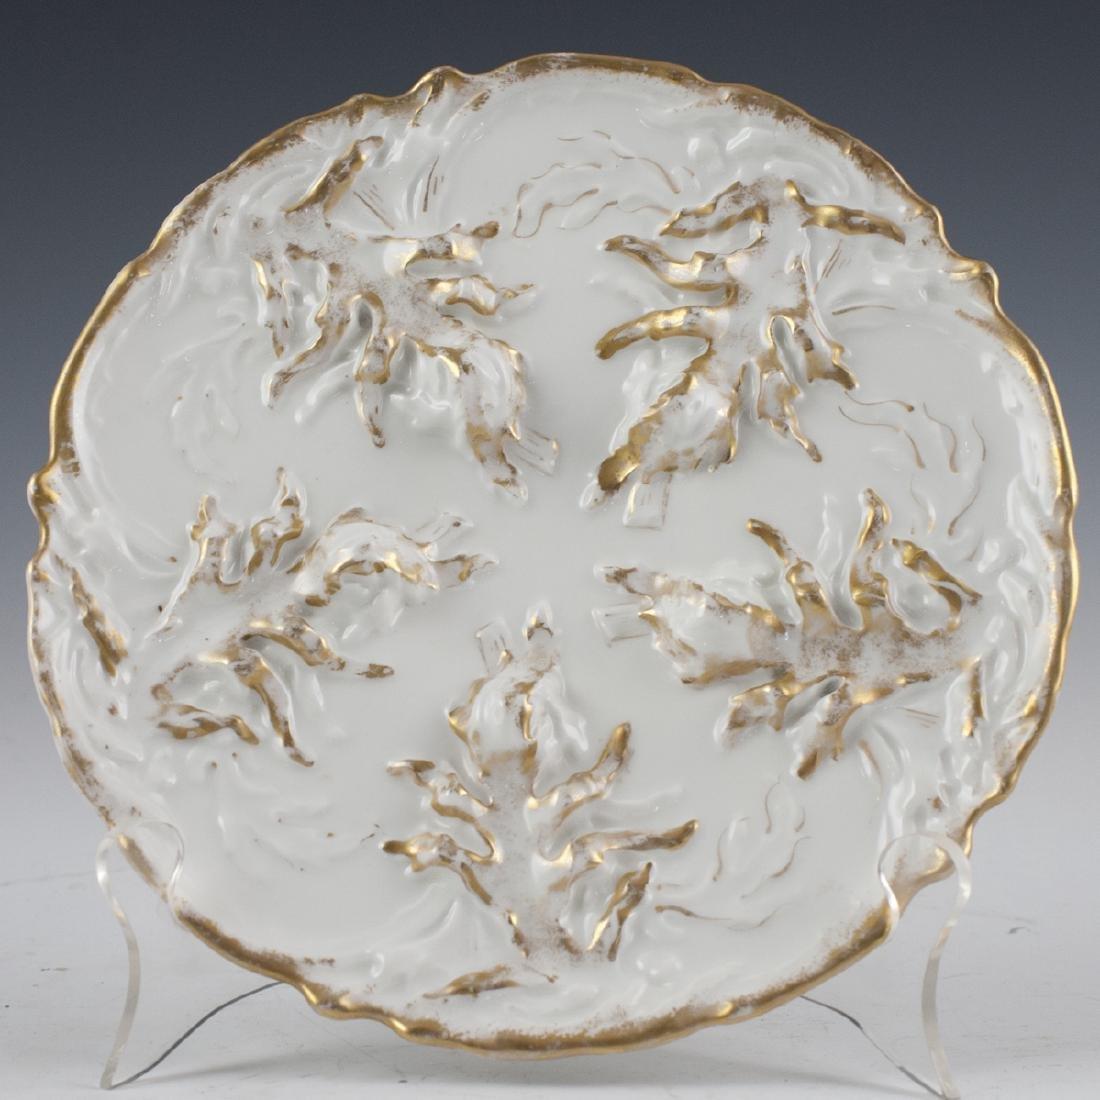 Theodore Haviland Limoges Porcelain Plate